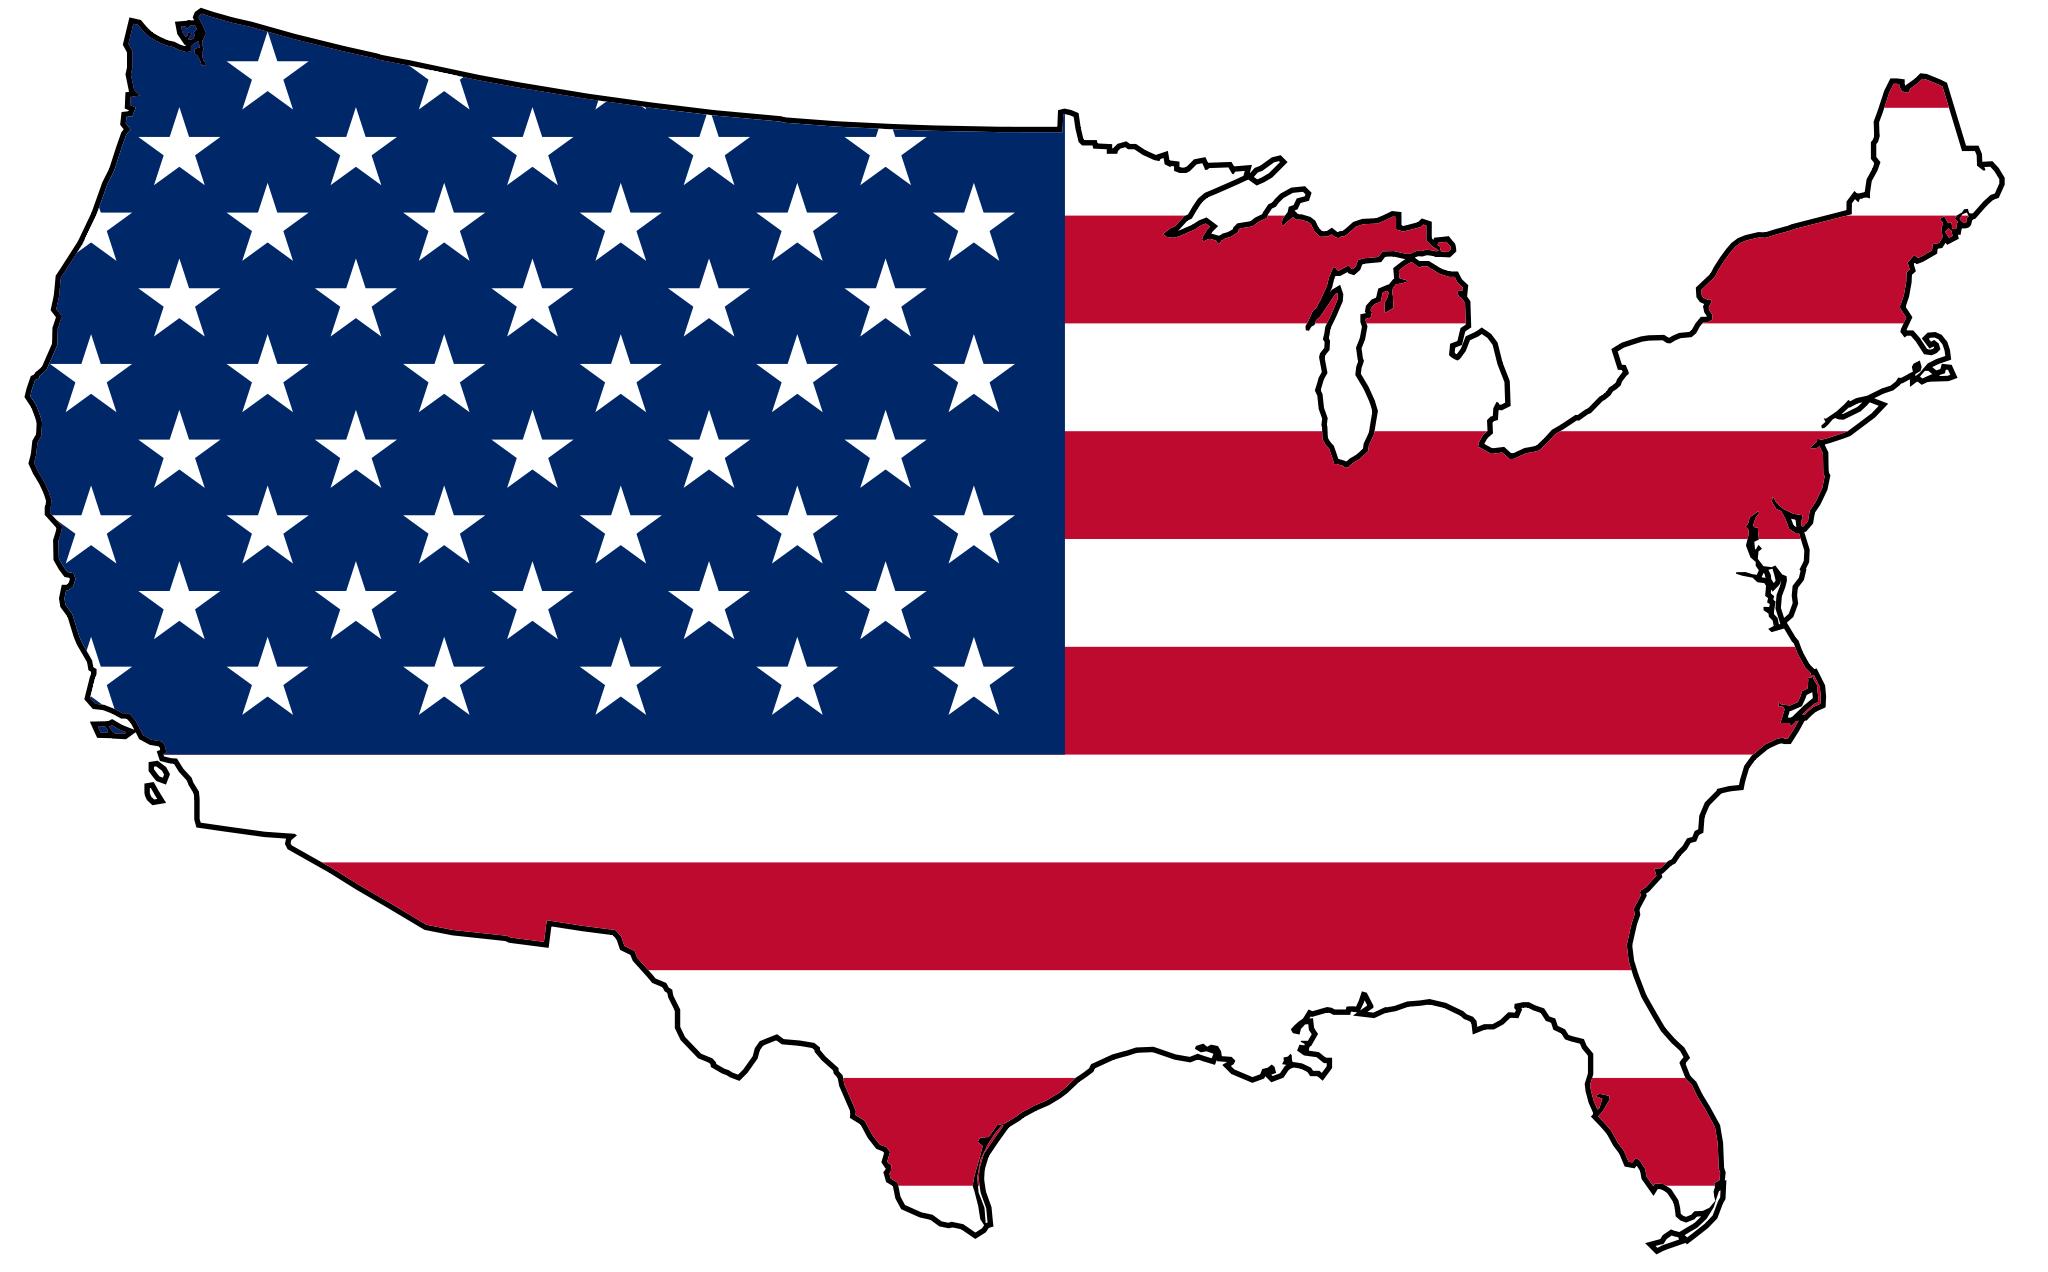 - United States of America